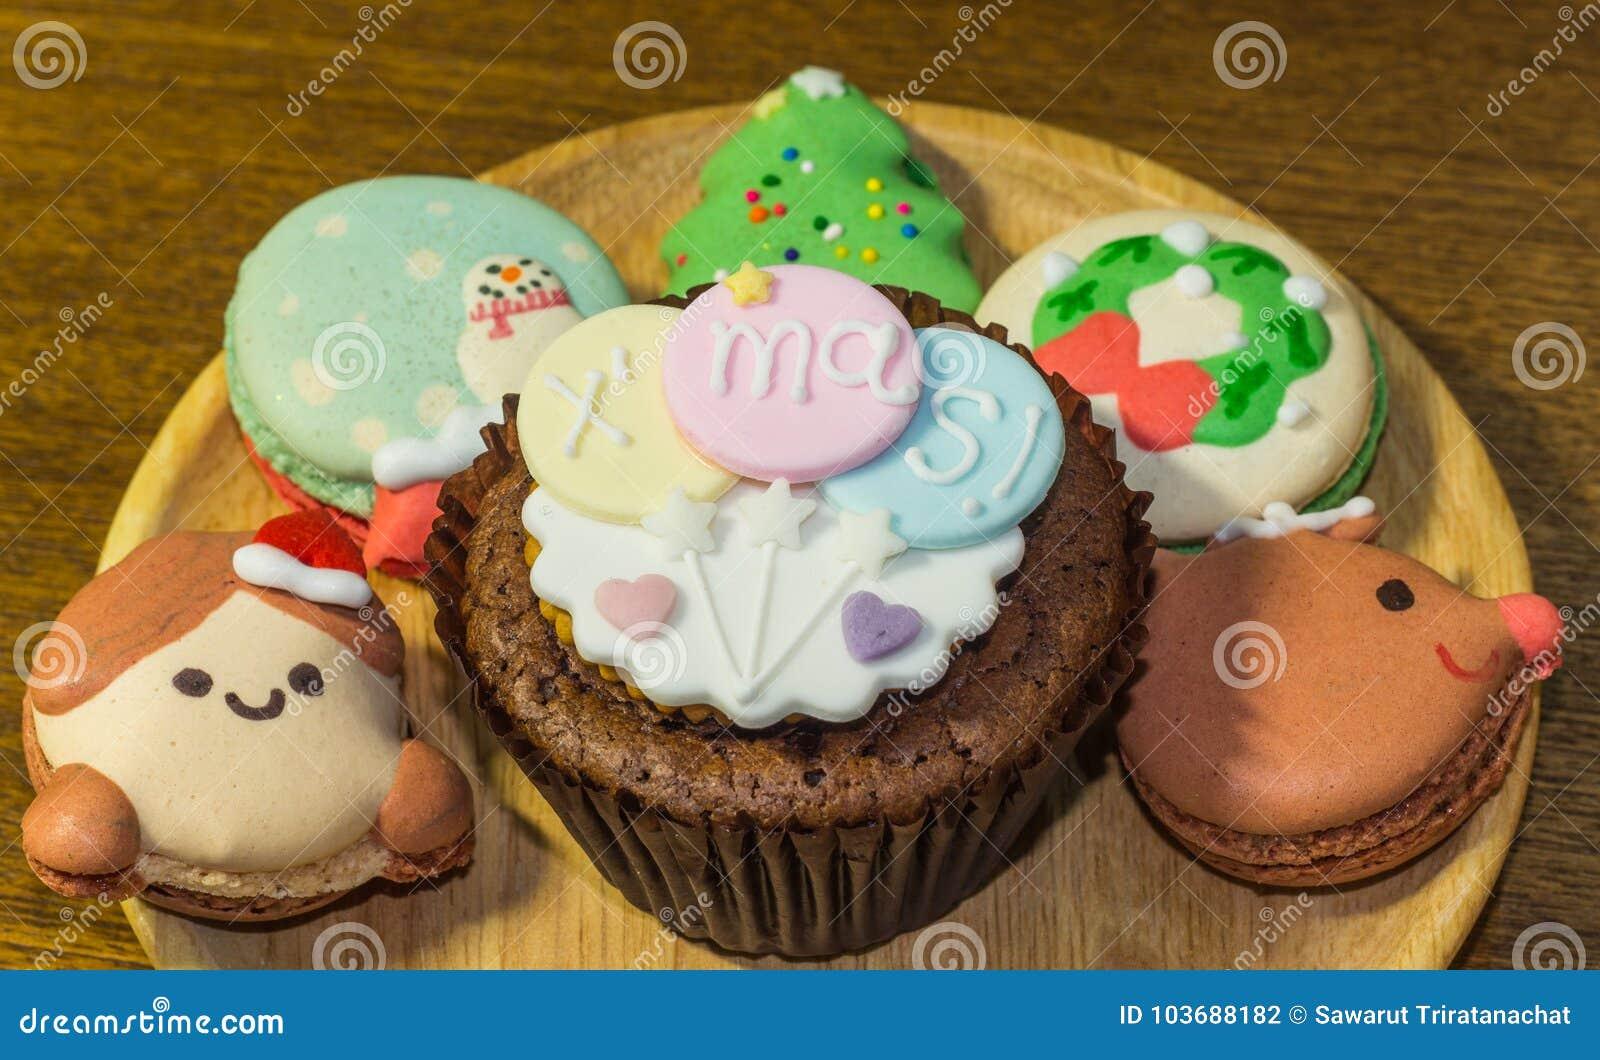 Cupcake και Macarons με τις καλές διακοσμήσεις Χριστουγέννων κατά τη διάρκεια του φεστιβάλ Χριστουγέννων